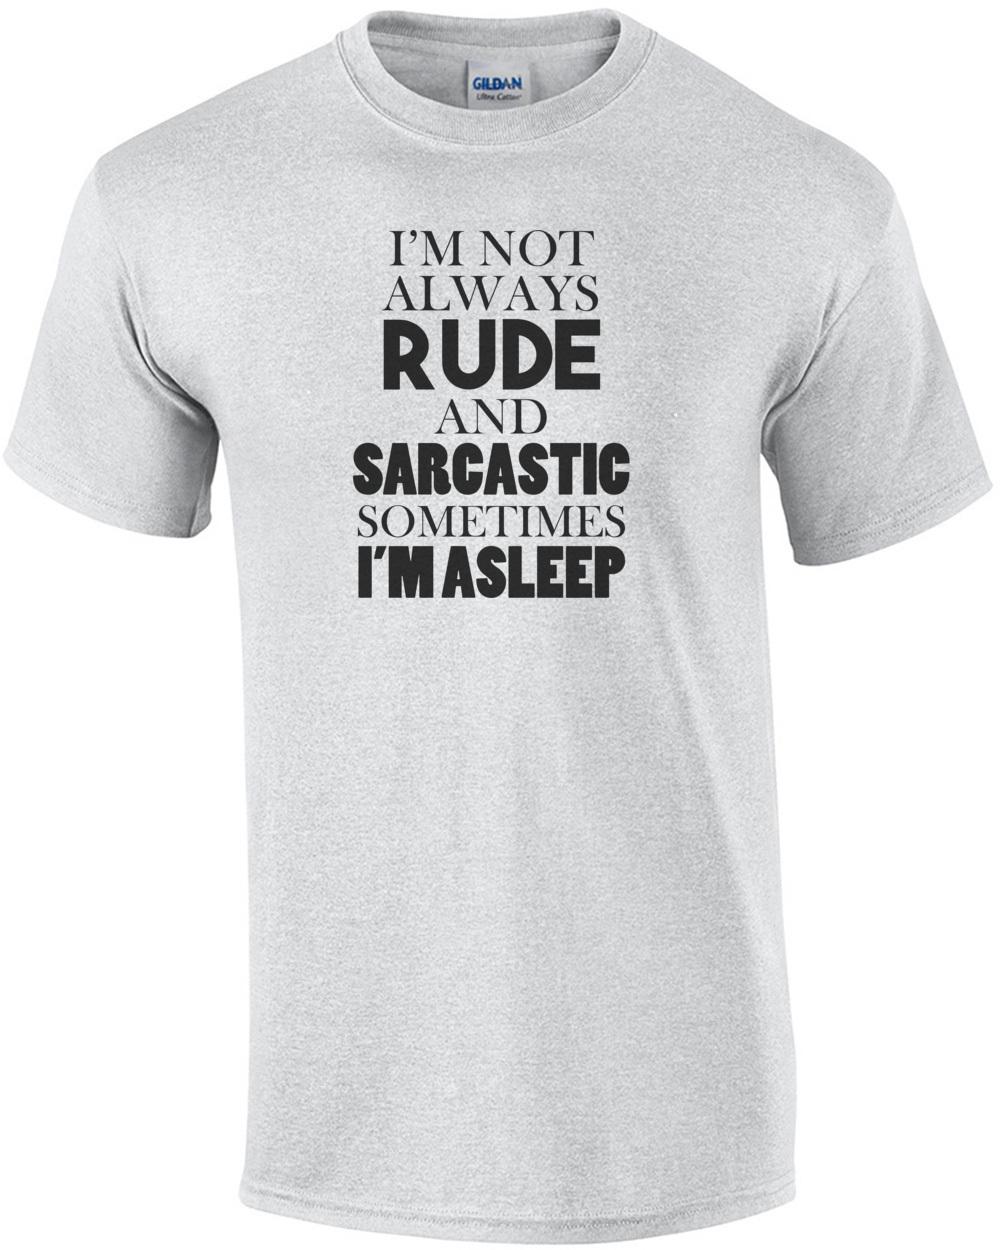 8d13b2985 im-not-always-rude-and-sarcastic-sometimes-im-asleep-tshirt-mens -regular-ash.jpg